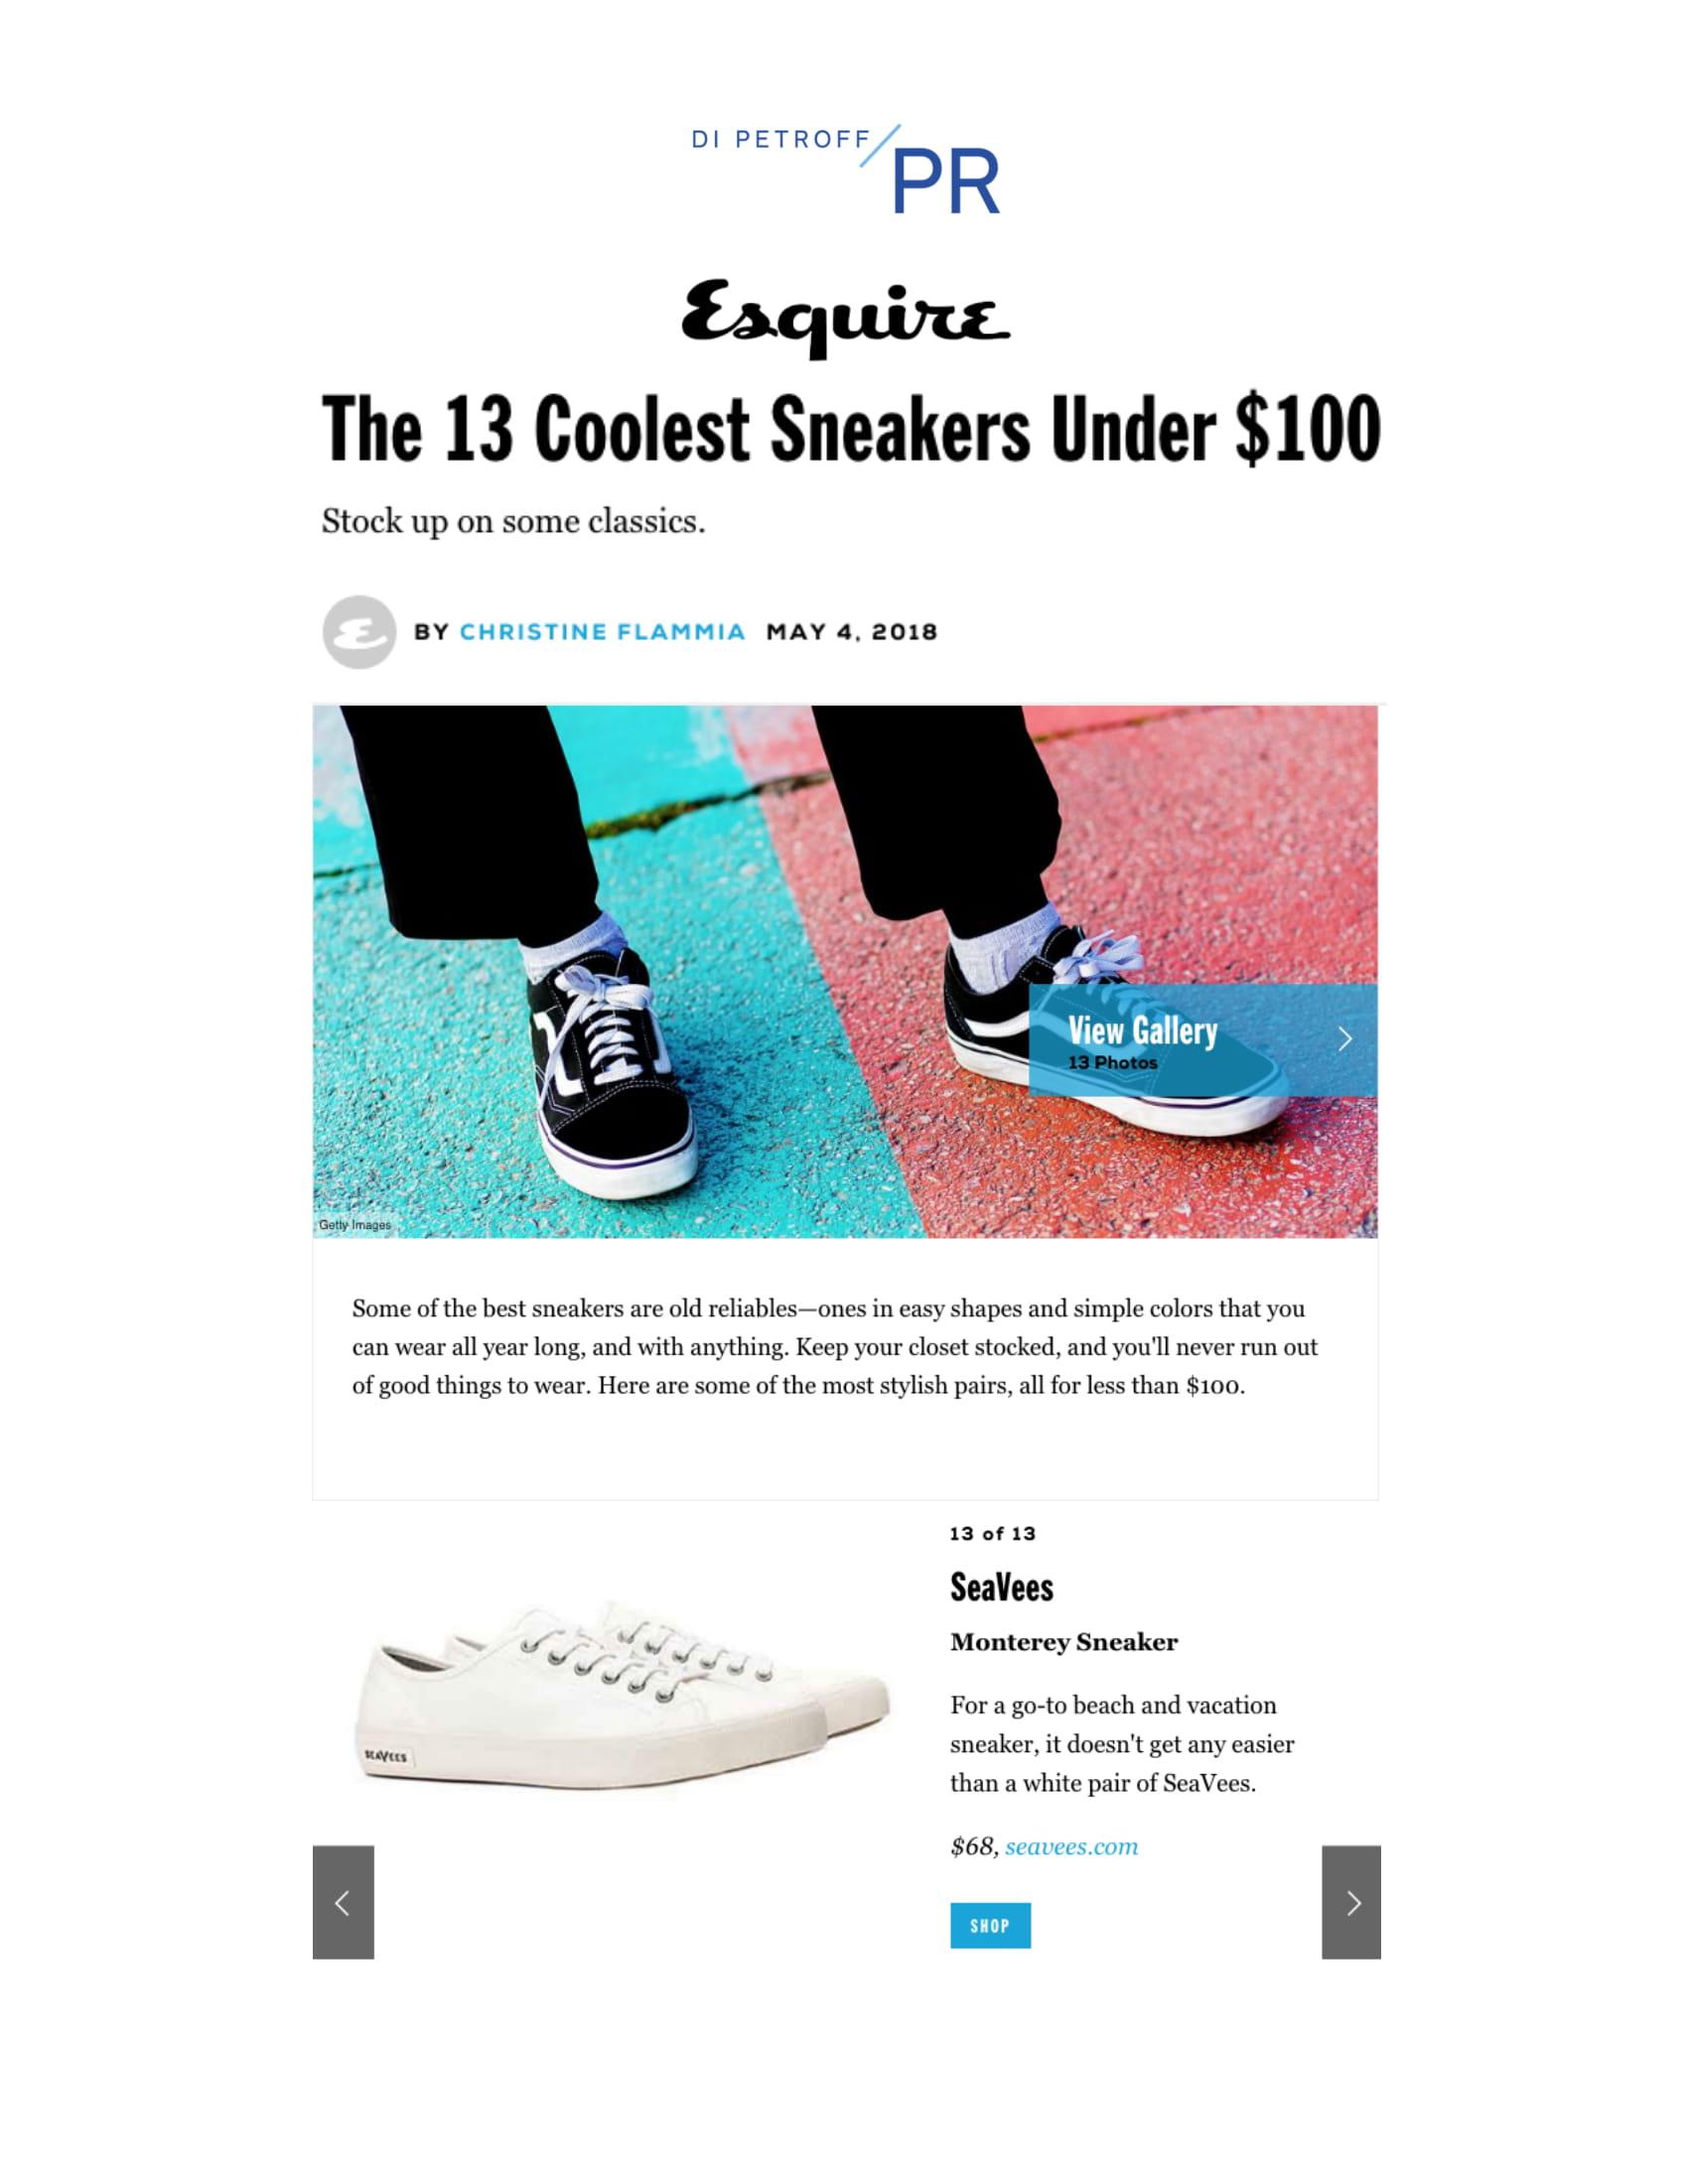 2018-05-04 Esquire.com SeaVees-1.jpg